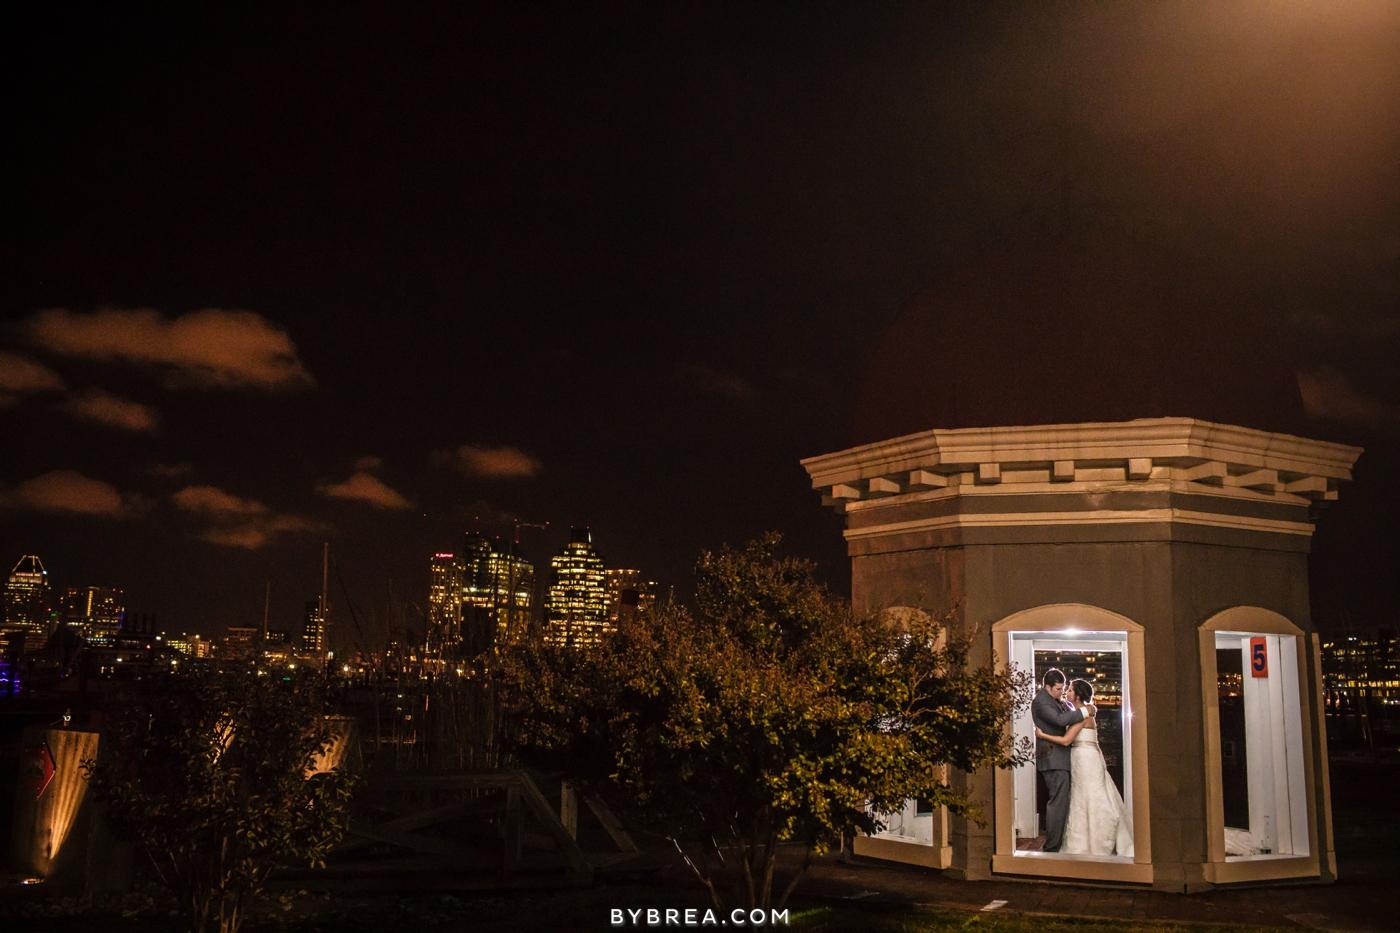 Baltimore wedding photo bride and groom under gazebo at night